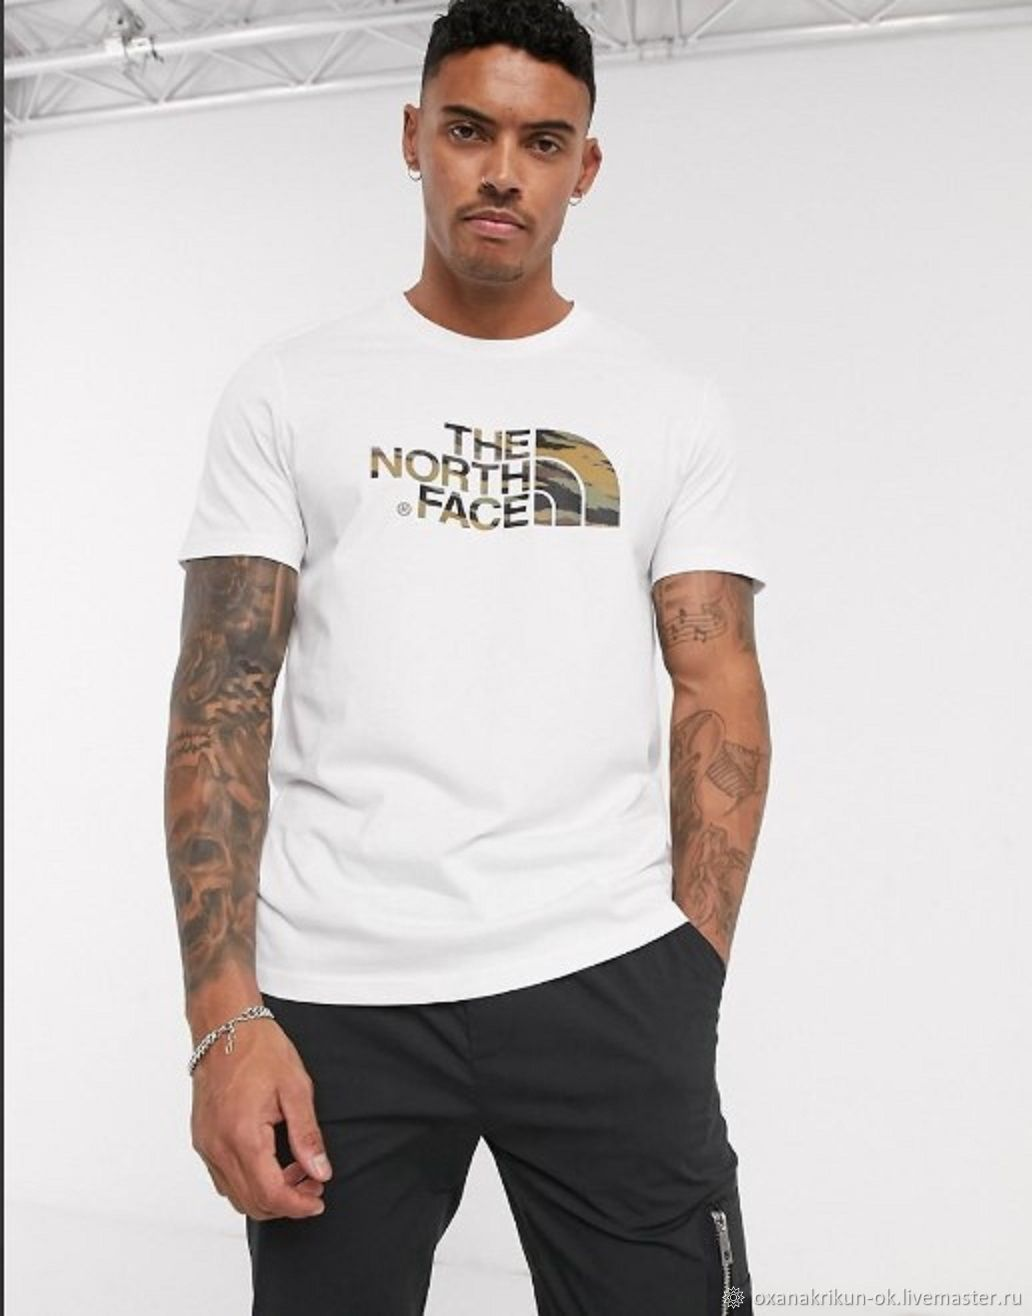 Мужская футболка от The North Face, Джемперы мужские, Нижний Новгород,  Фото №1